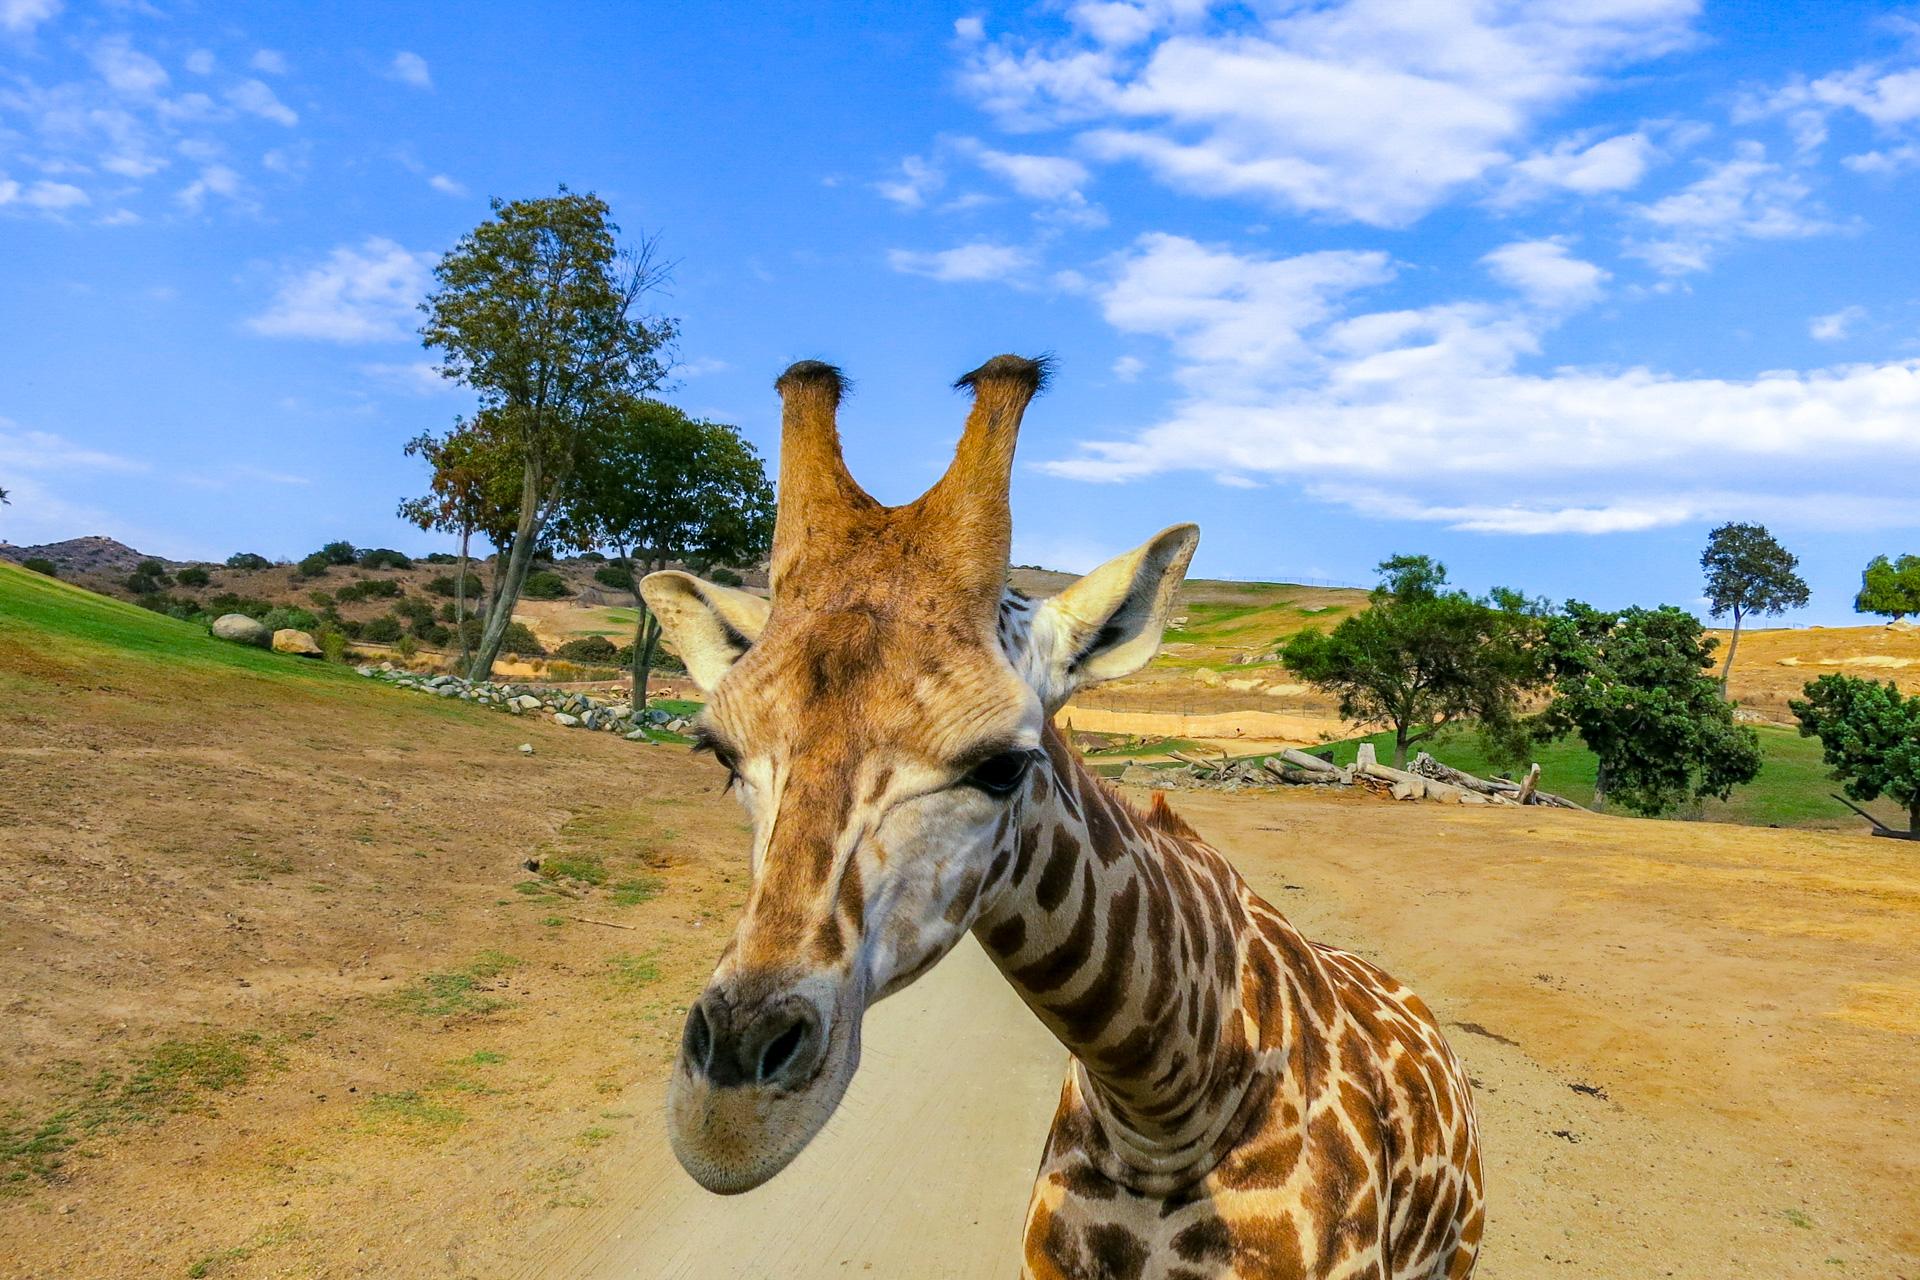 giraffe san diego zoo; Courtesy of Melanie Faulstick/Shutterstock.com